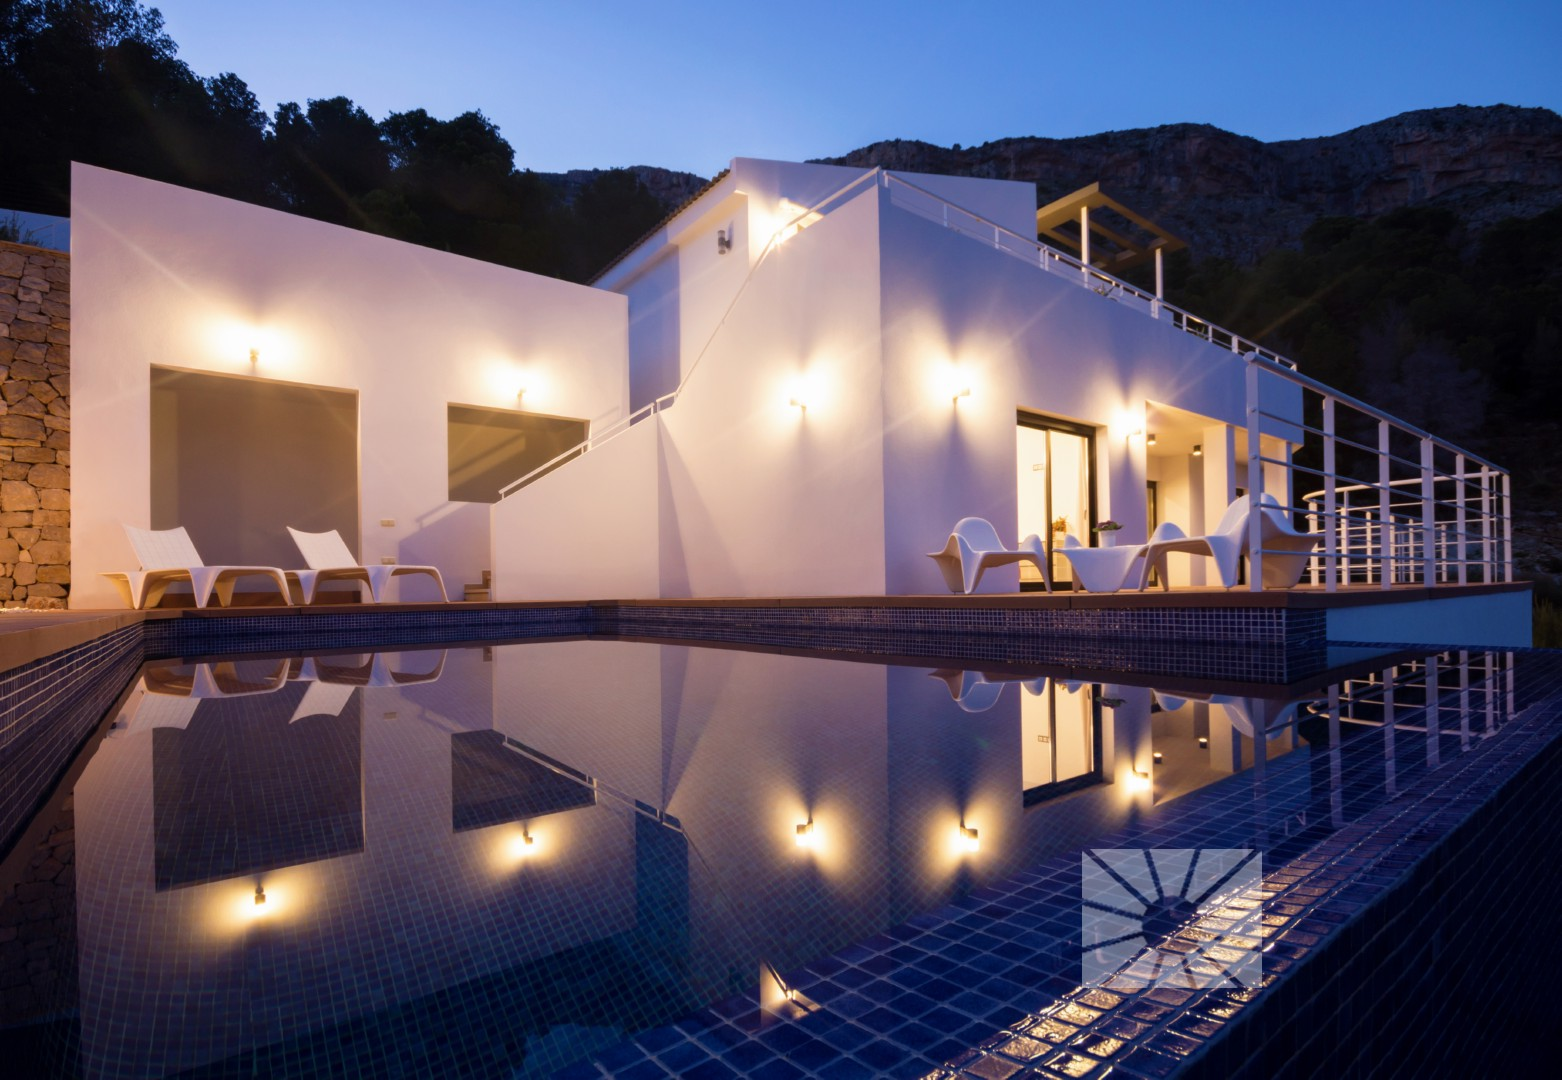 Azure altea homes moderne villa te koop ref hb